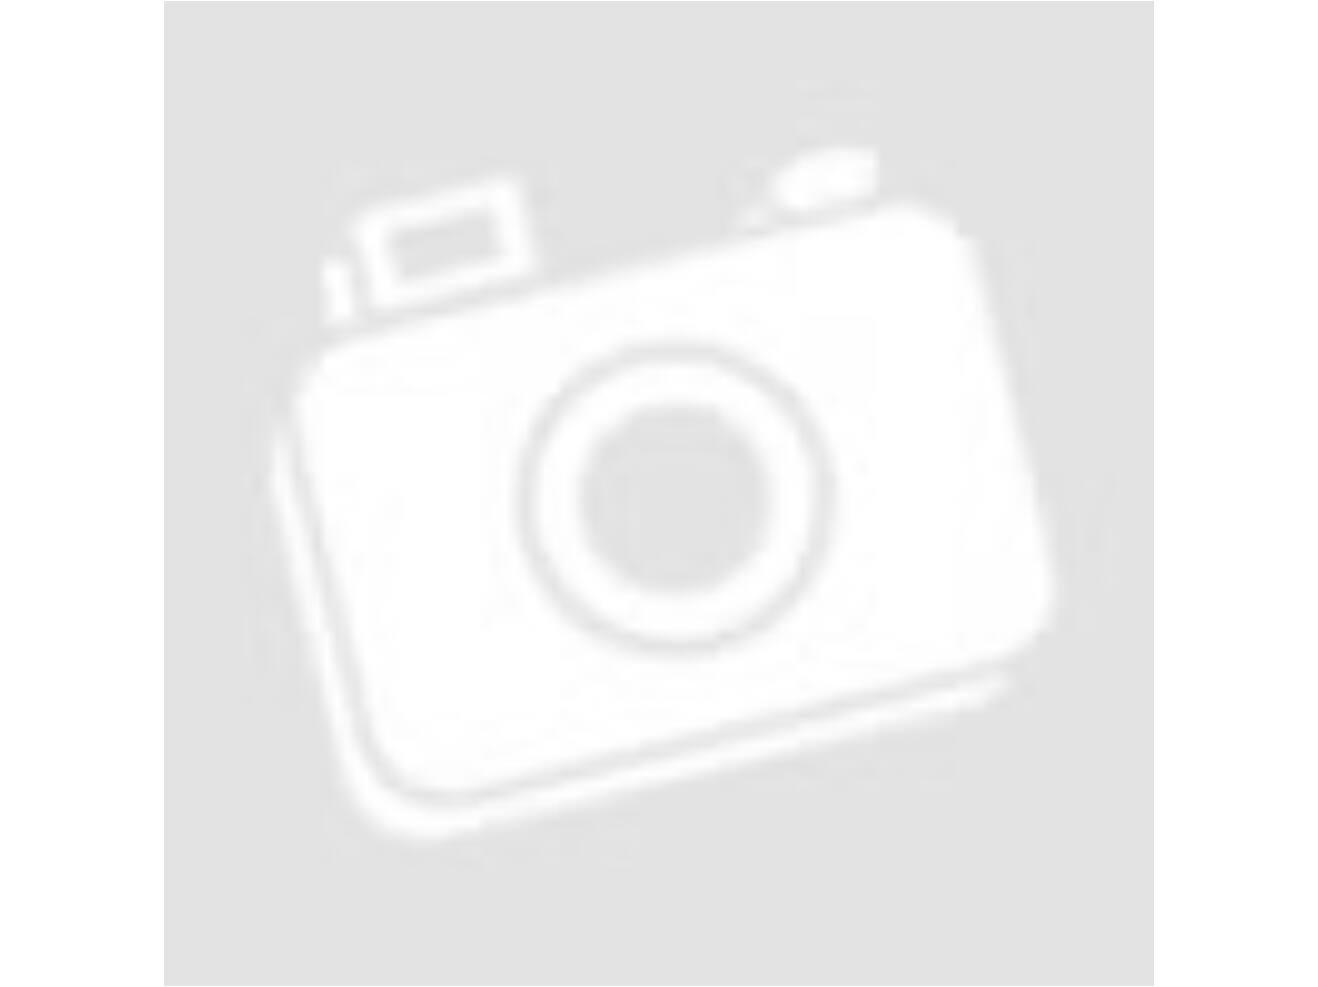 JR NIKE MAGISTA OBRA II FG - FG AG (Műanyag stoplis) - Alexandersoccershoes b6b9aad818